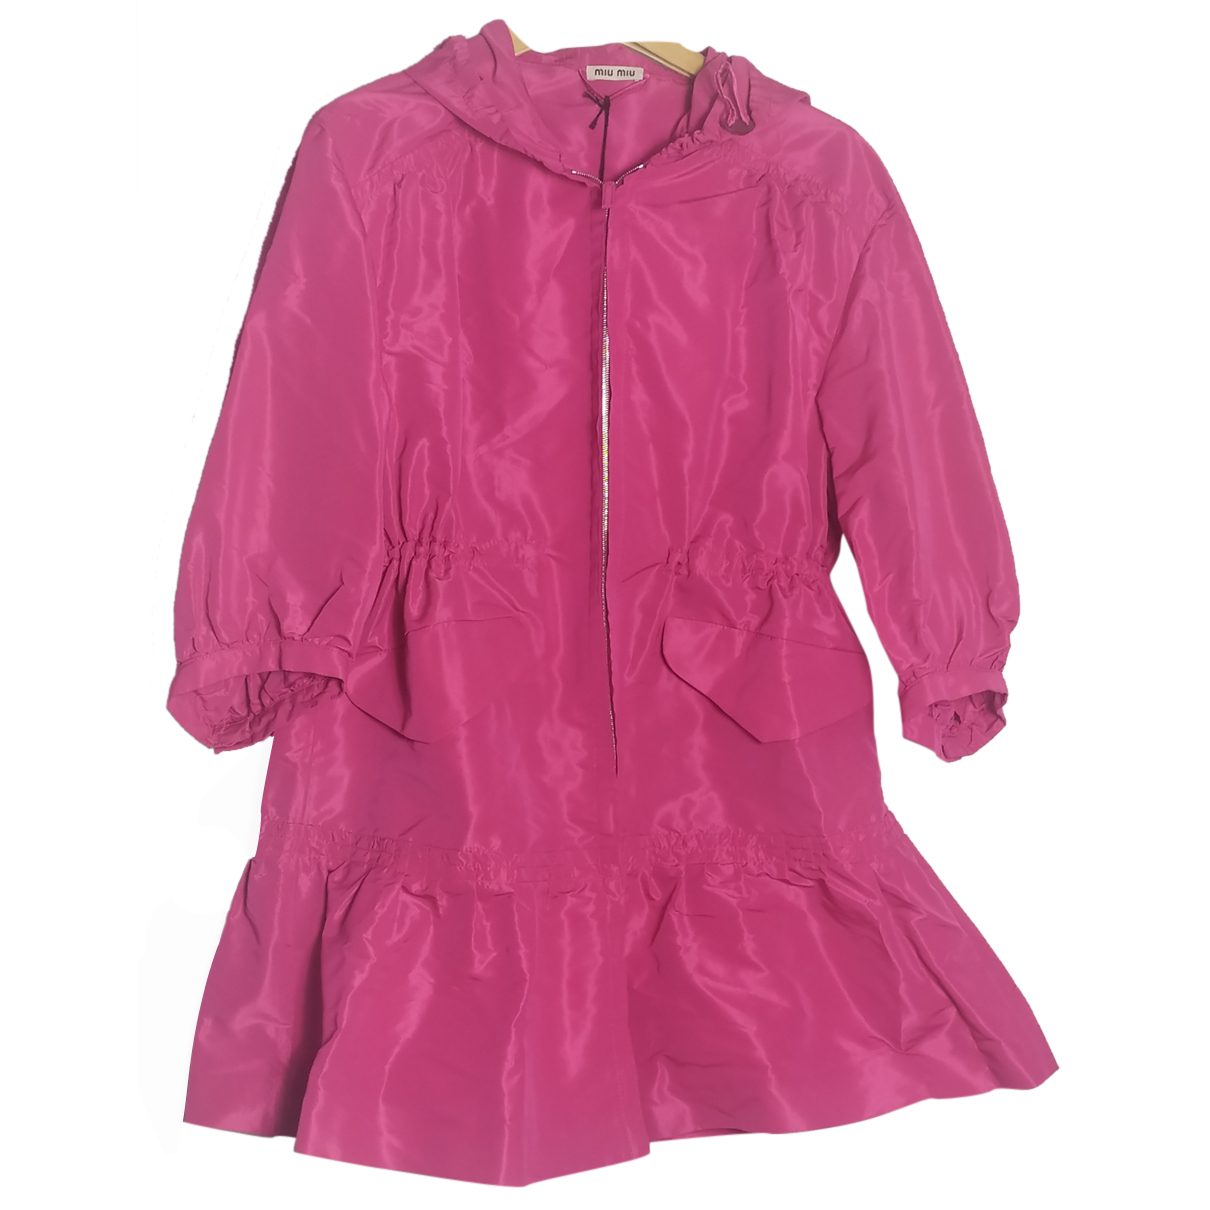 Miu Miu N Pink jacket for Women 42 IT